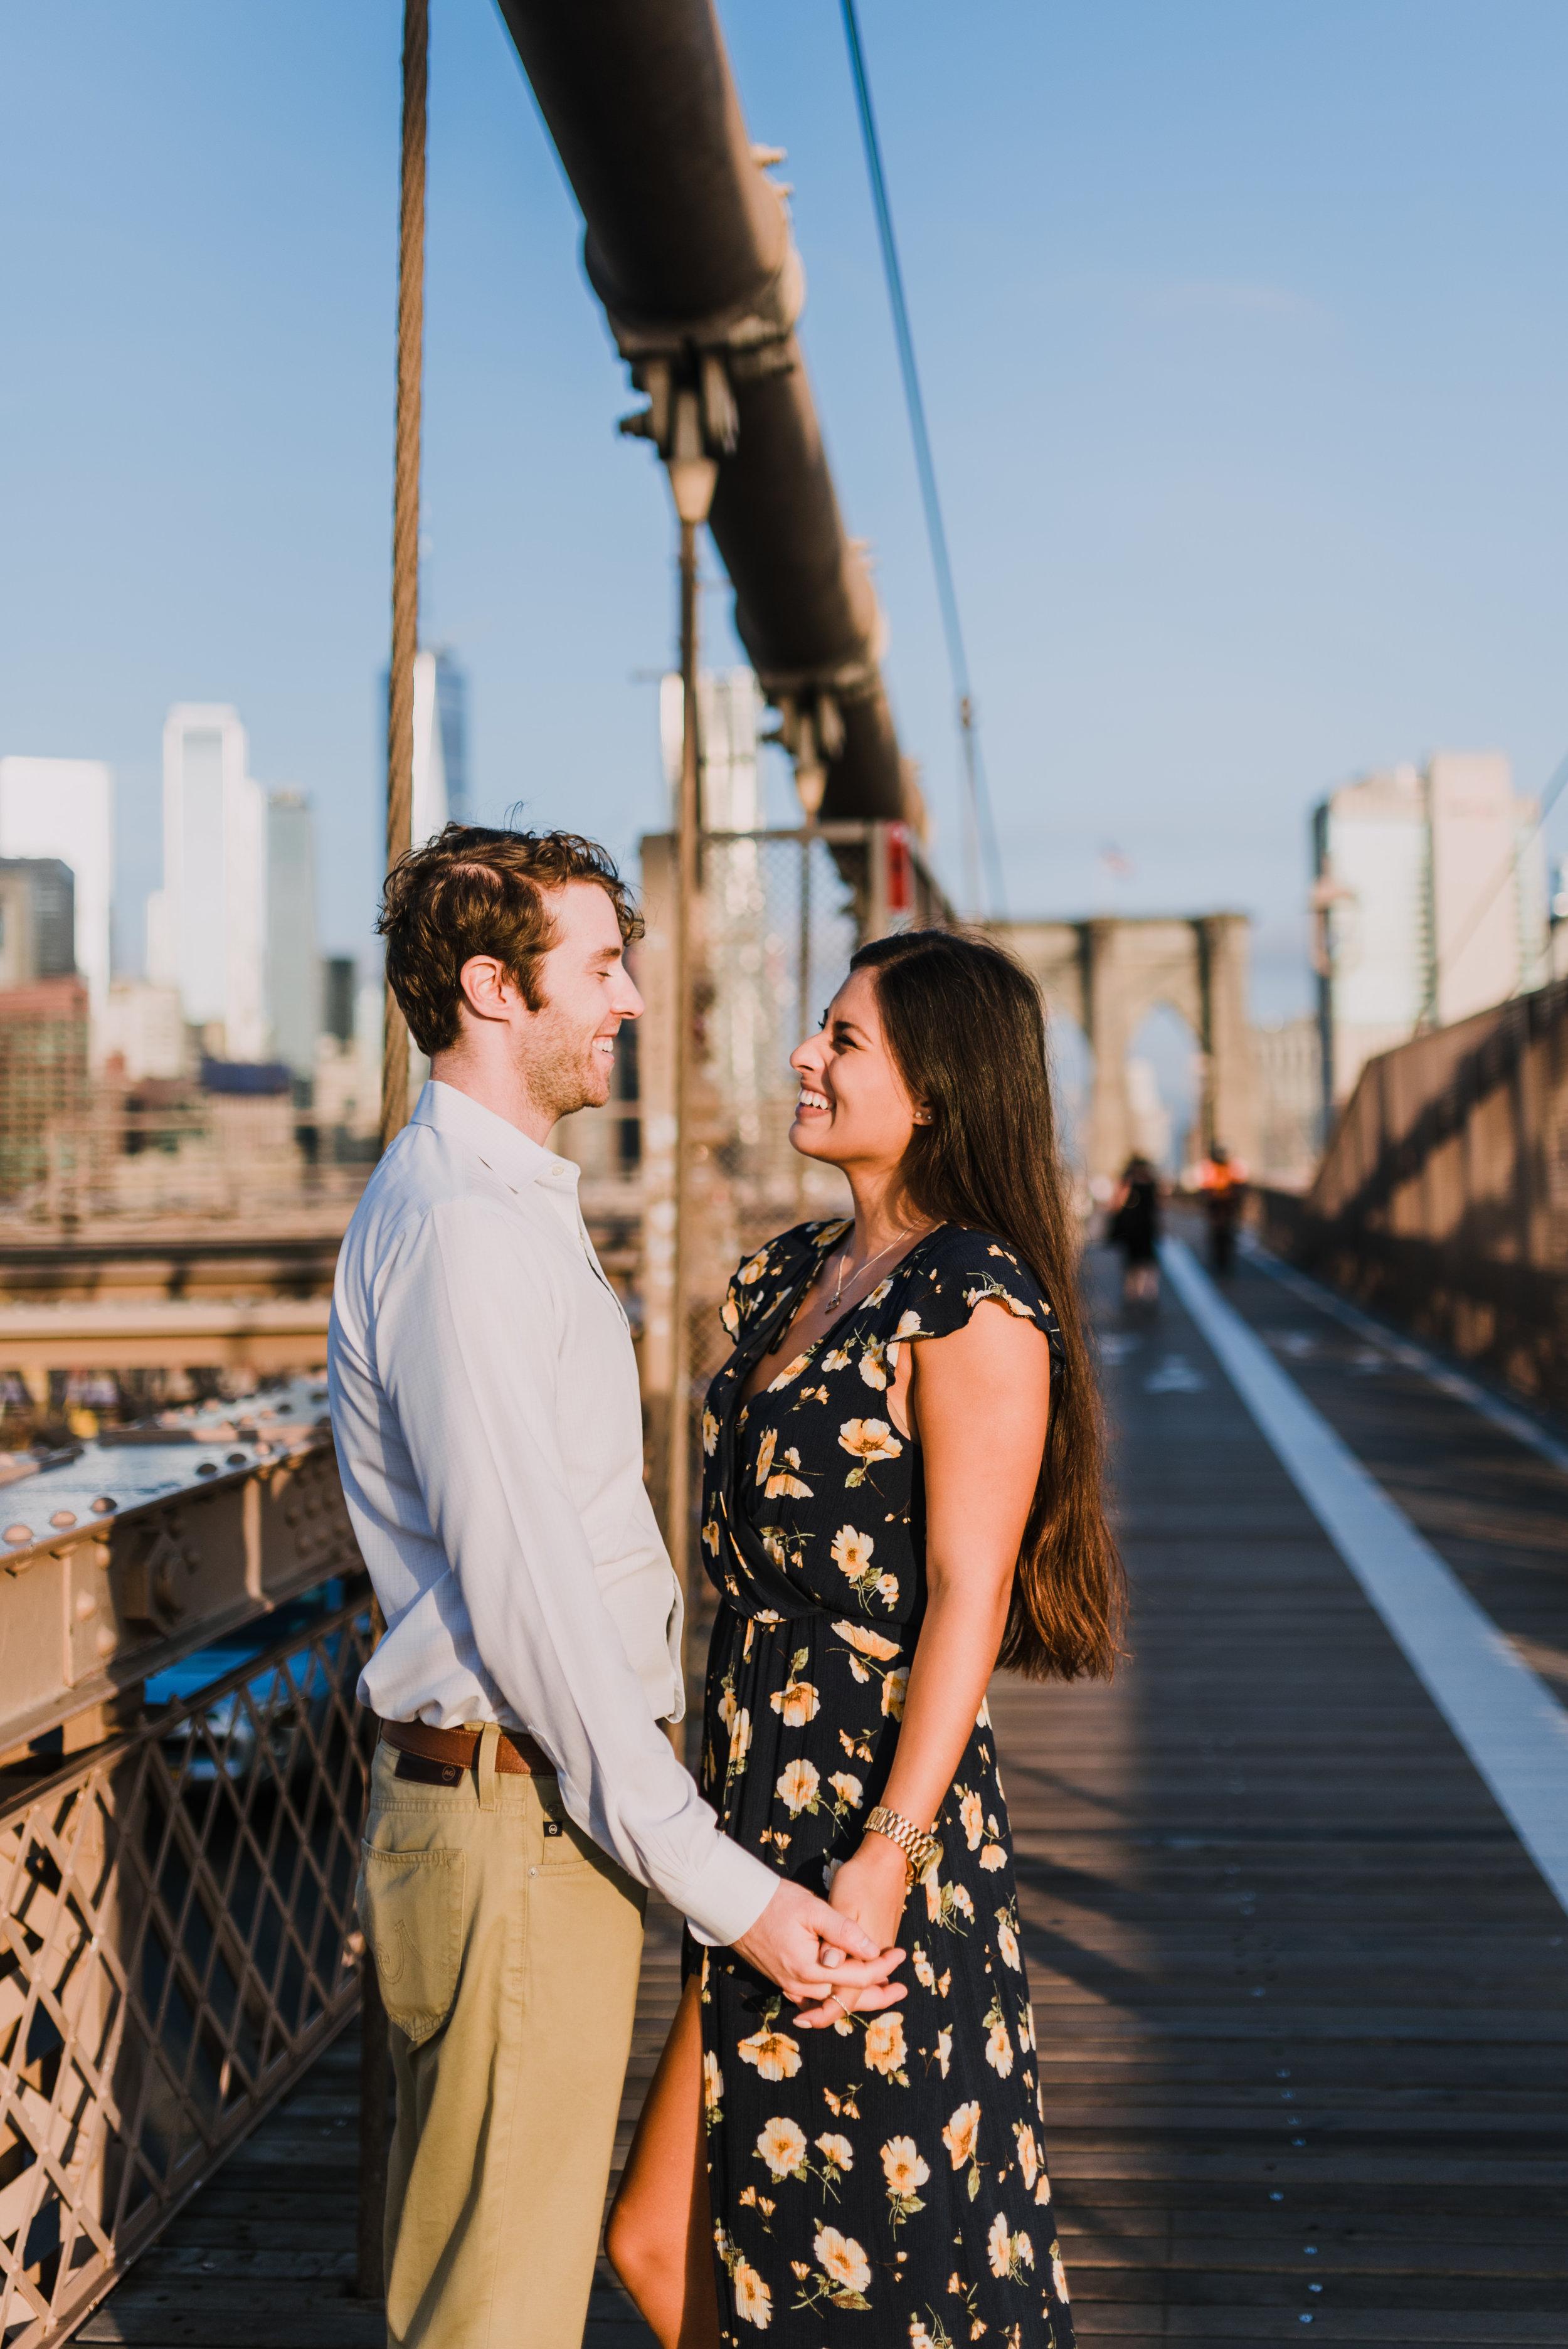 brooklyn bridge engagement shoot, couple shoot nyc, nyc wedding photographer, destination wedding photographer, documentary wedding photographer in nyc (18).jpg